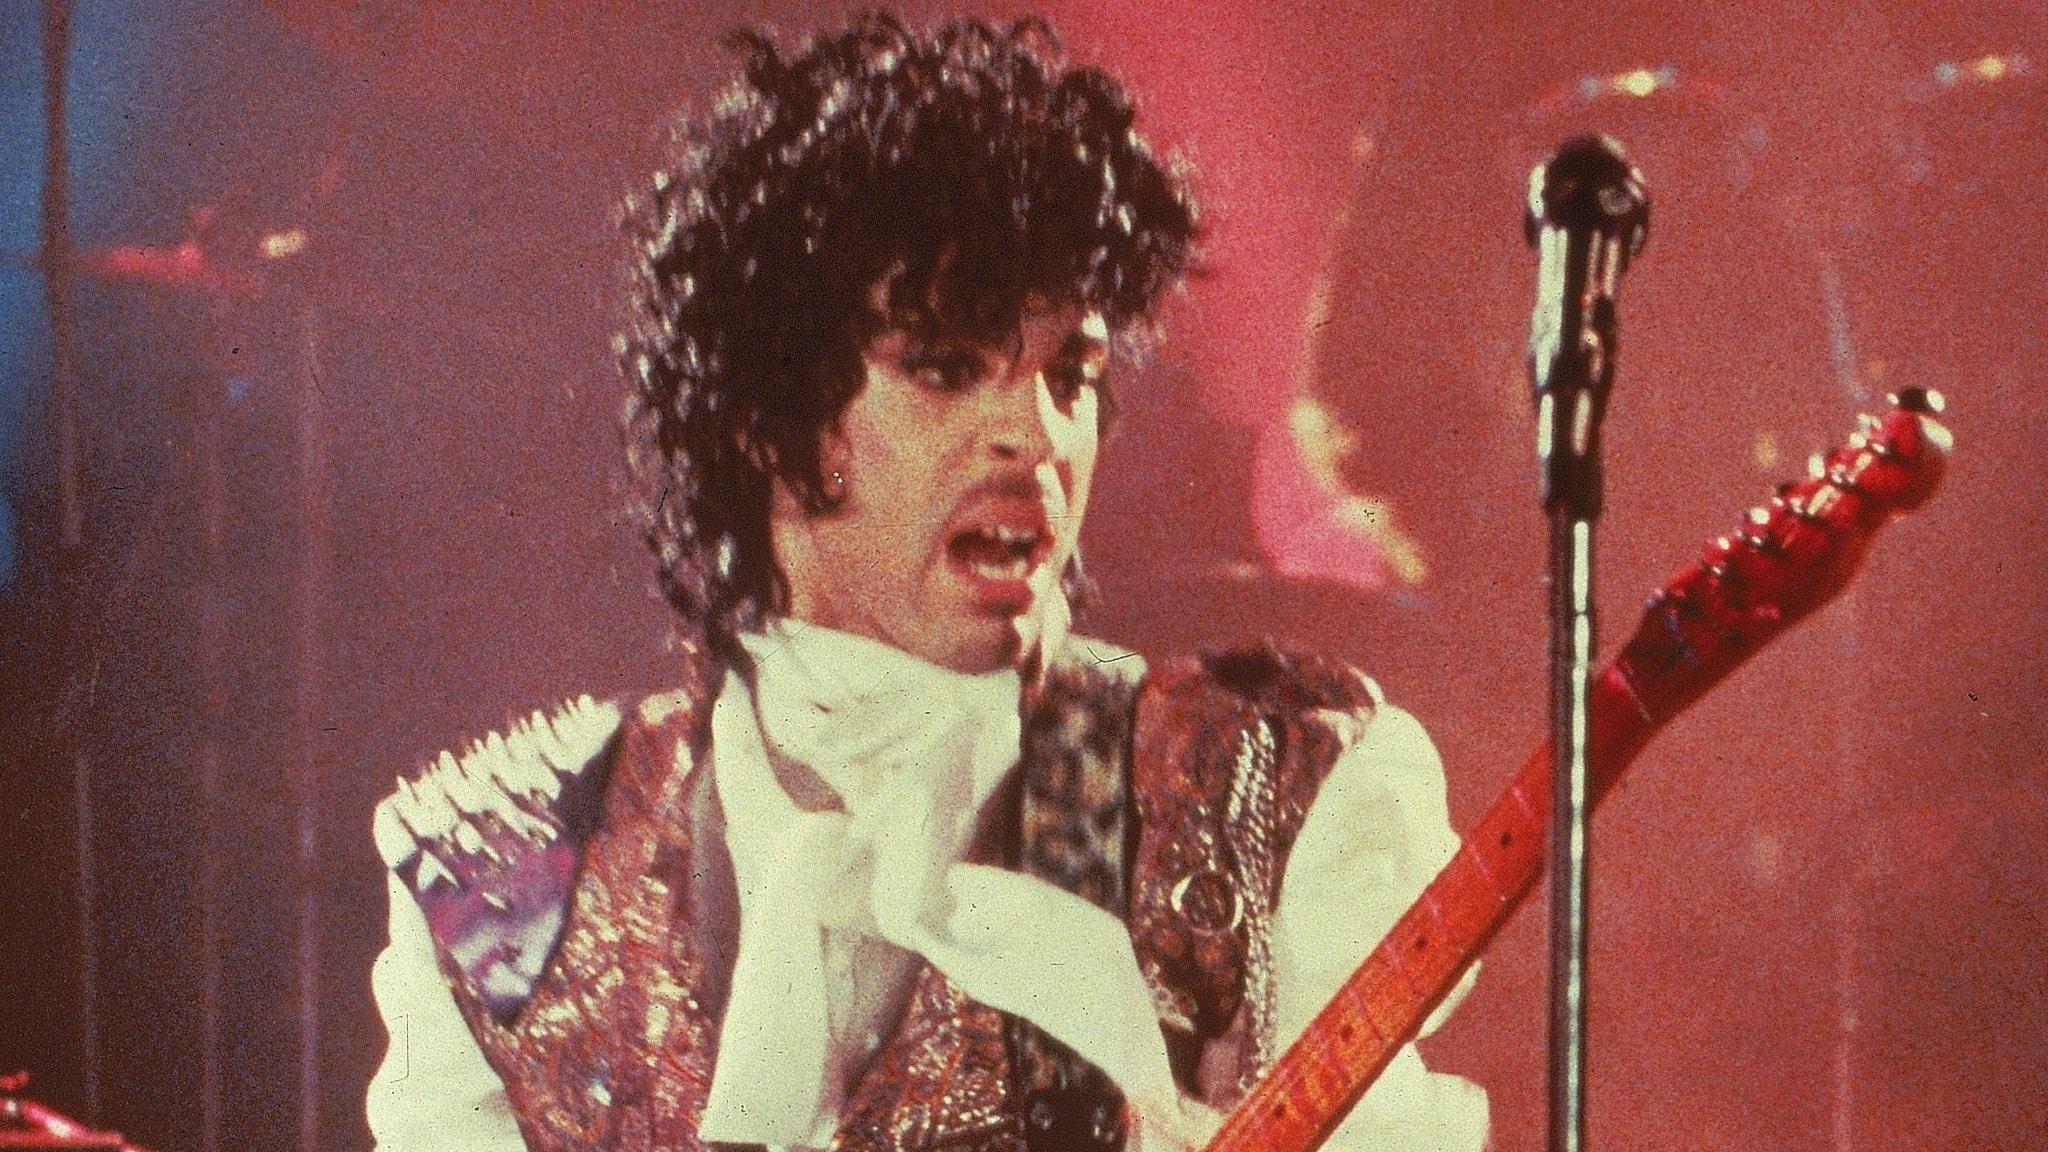 Prince i filmen Purple Rain från 1984.